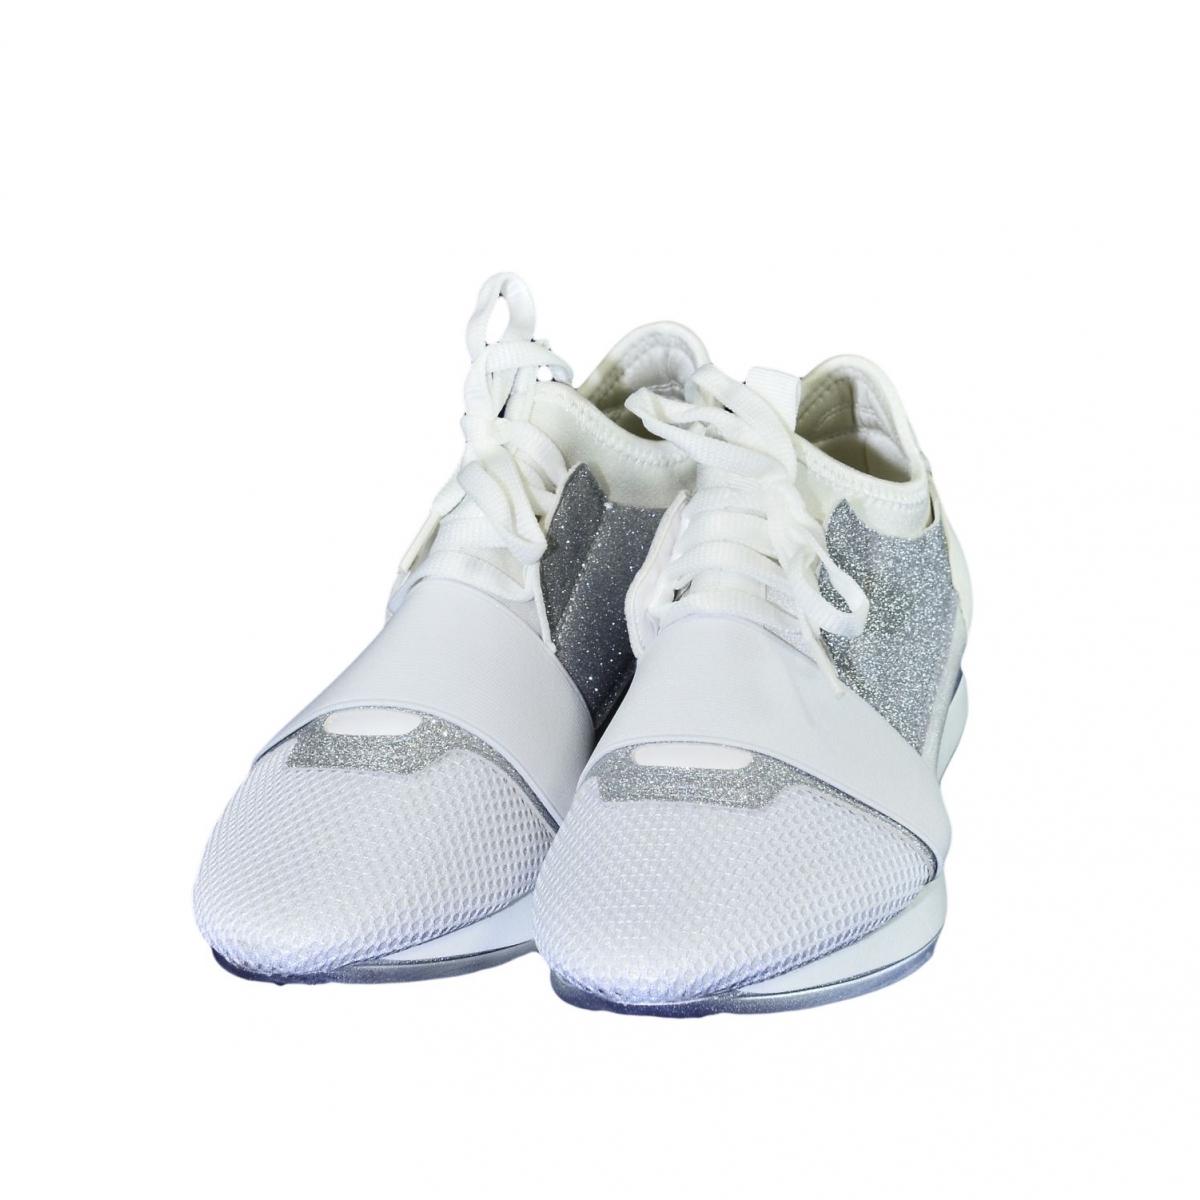 Dámske bielo-strieborné botasky BRIEN - 3 ece0d9fba9c